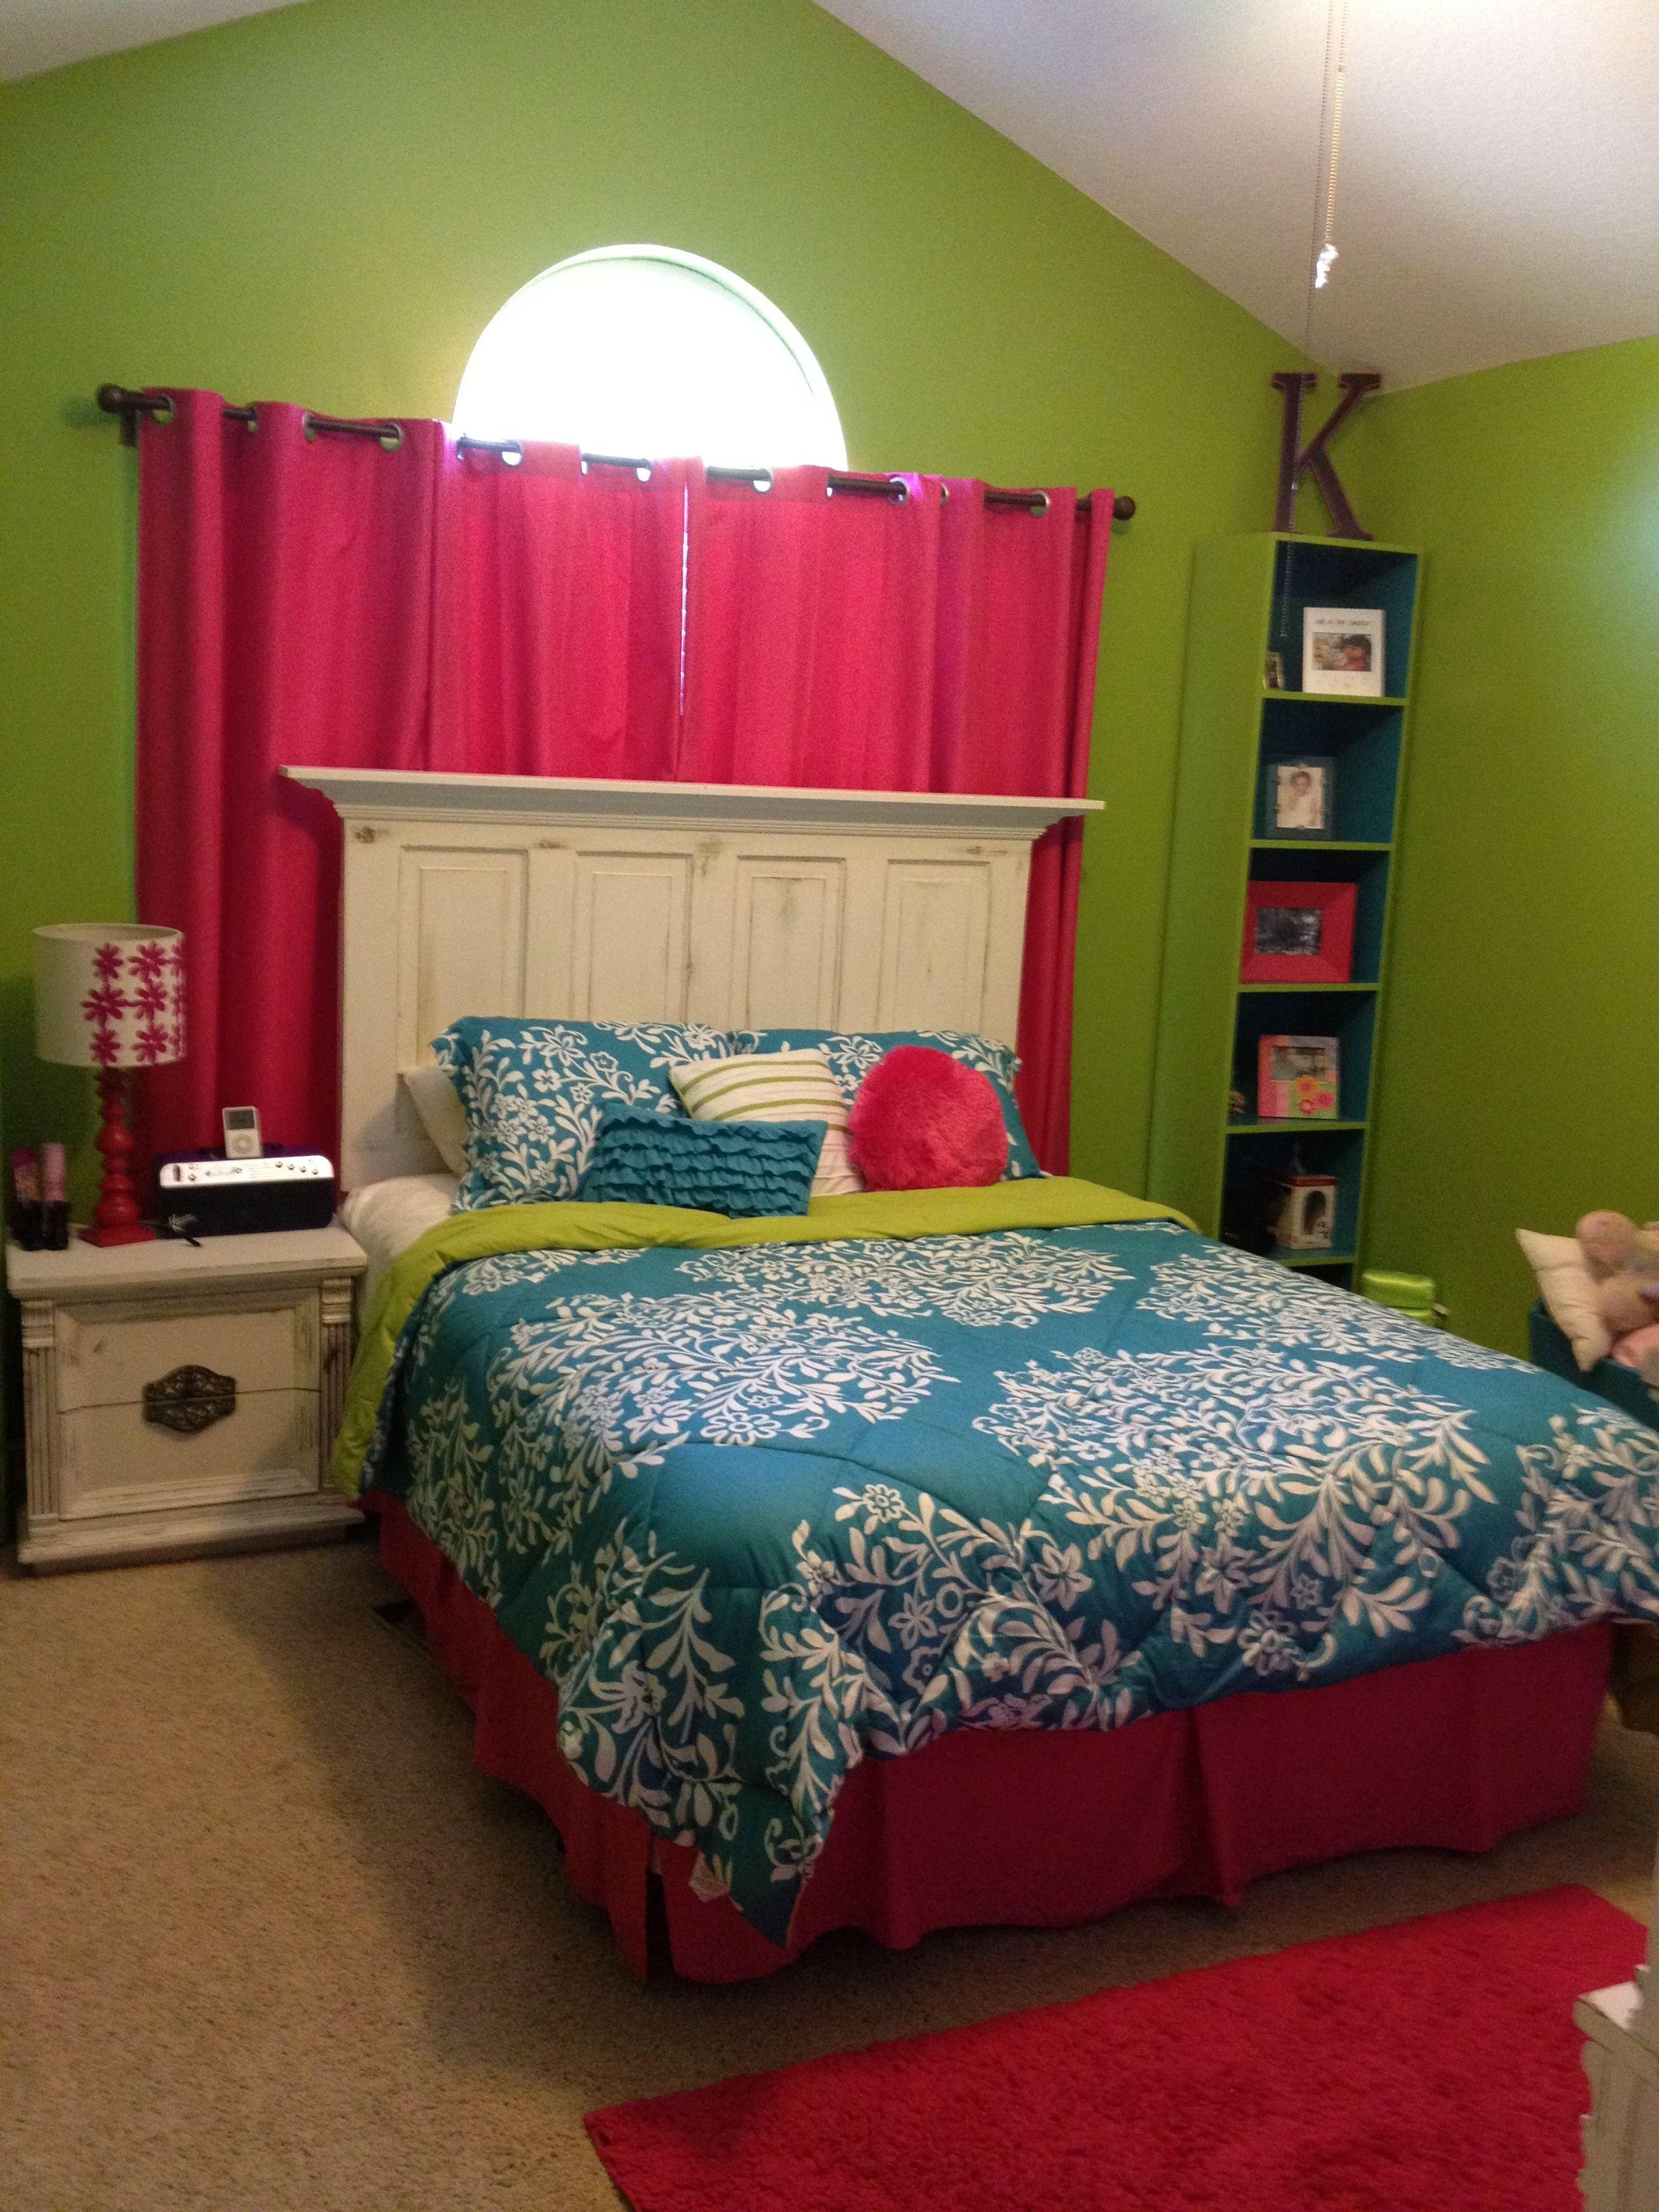 Cute Little Girls Room  For Katie Belle  Pinterest  Room Bedrooms and Kids rooms